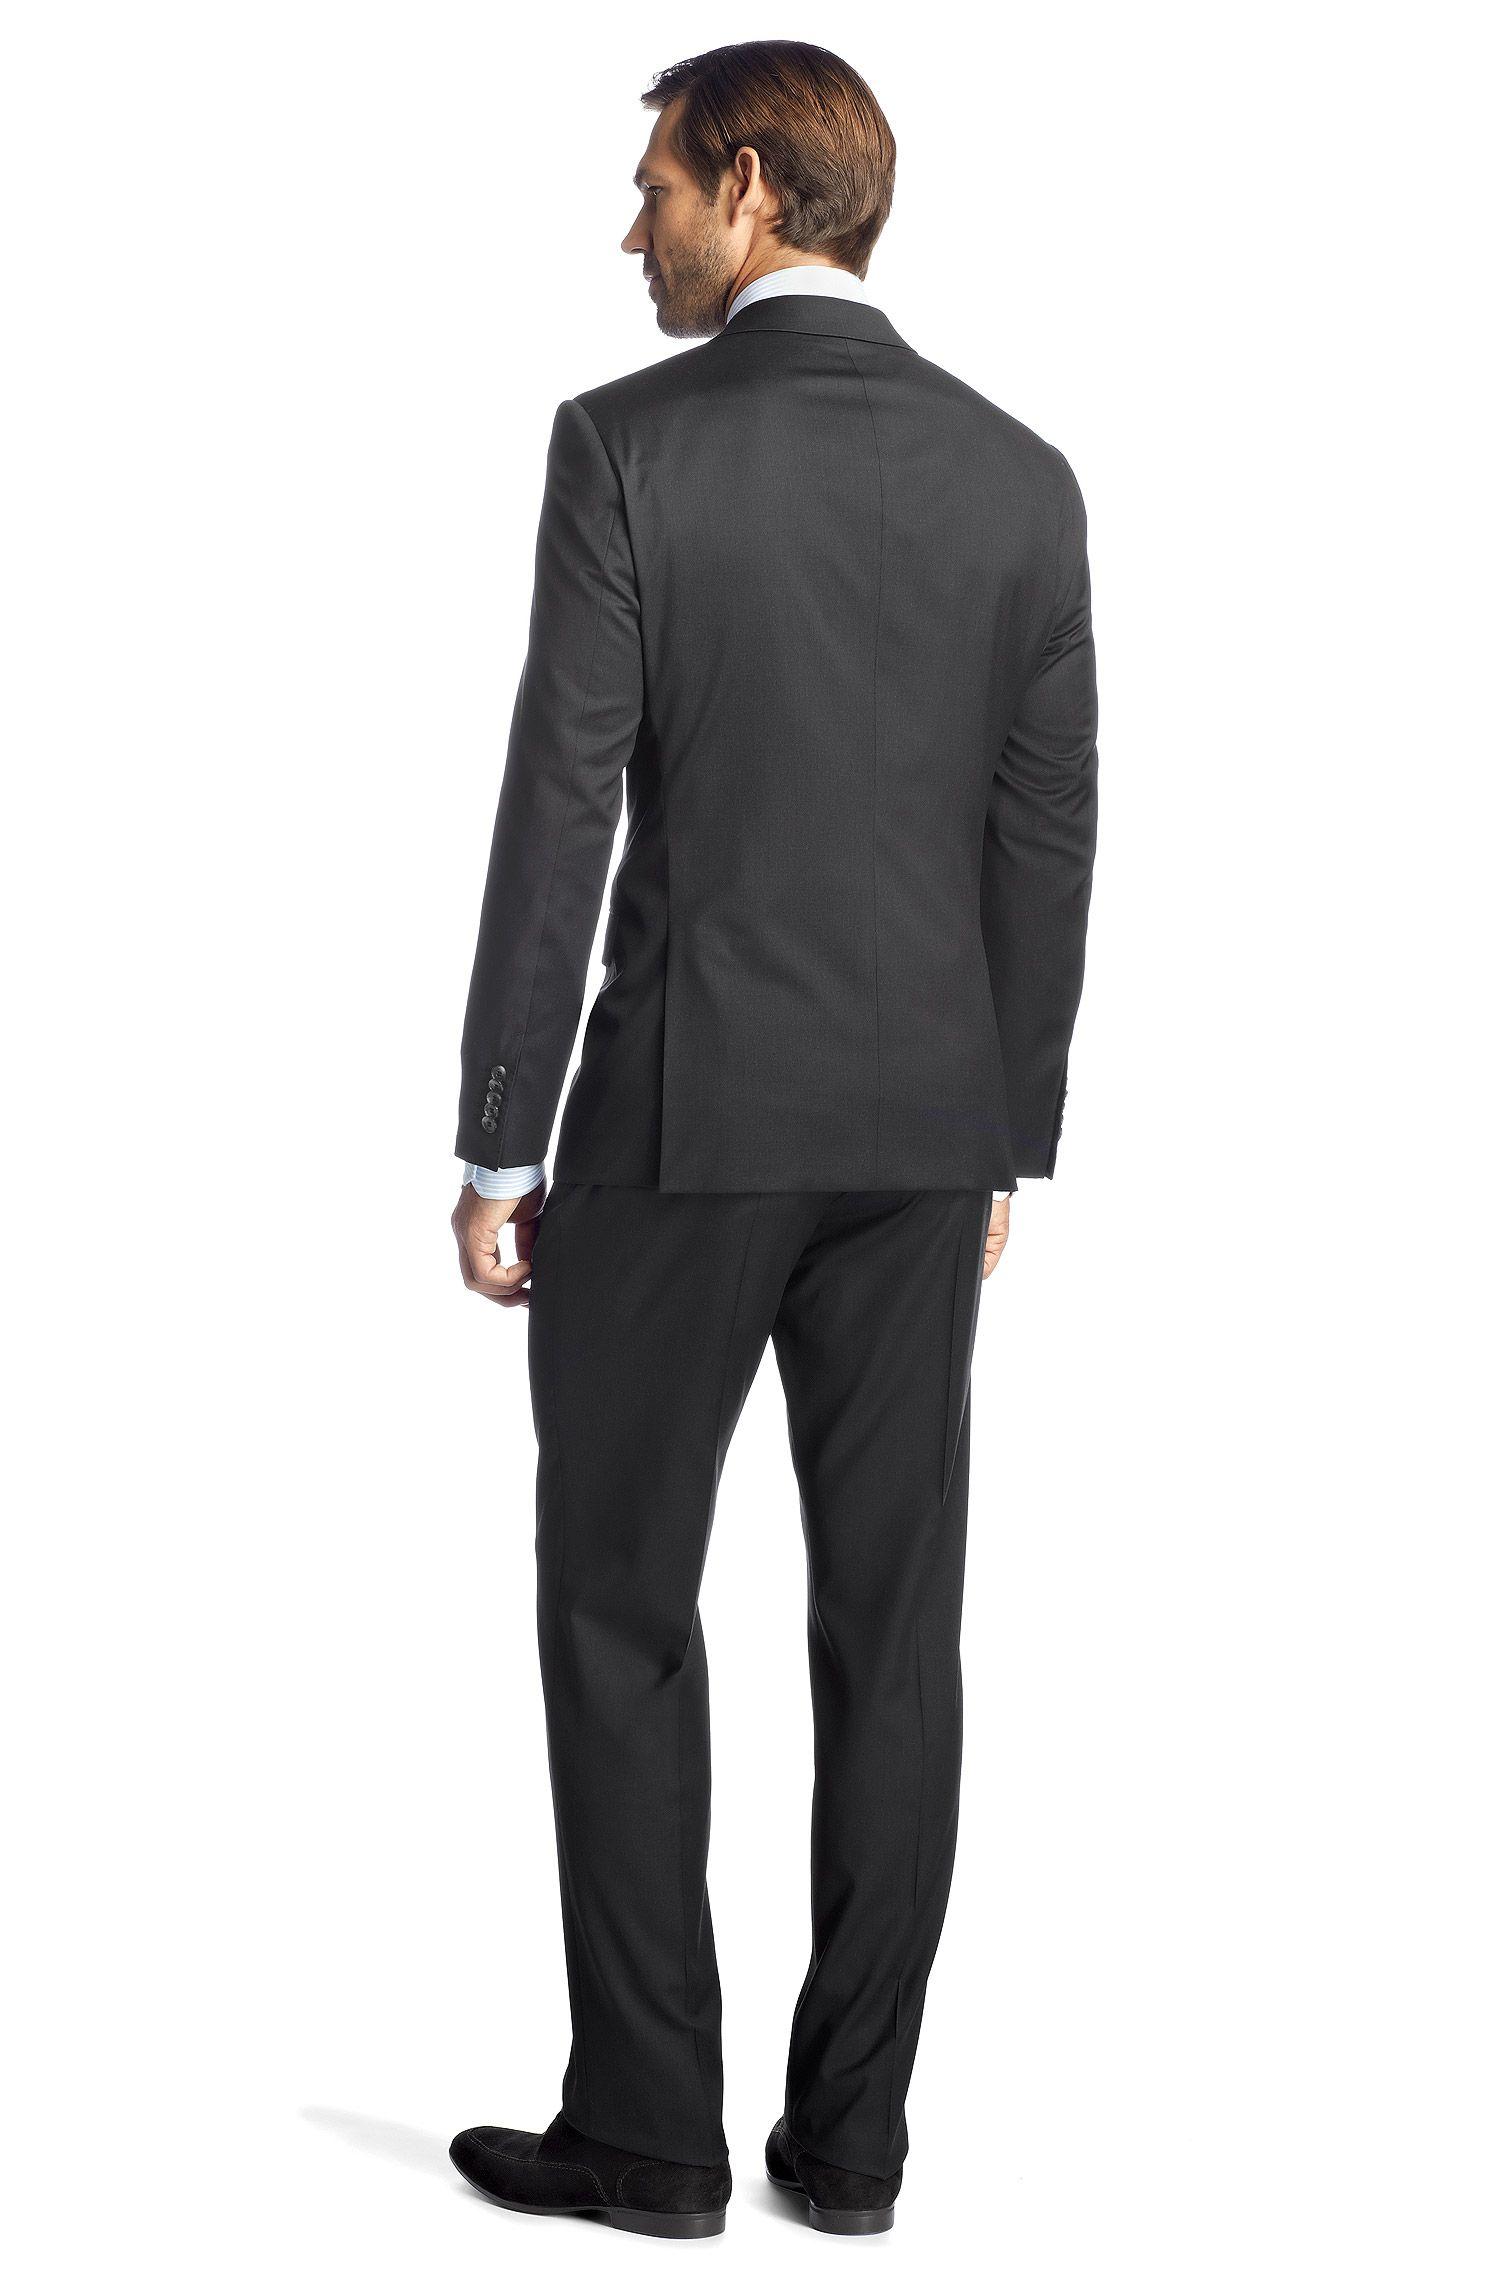 Costume de coupe Regular Fit, Howard1/Court2